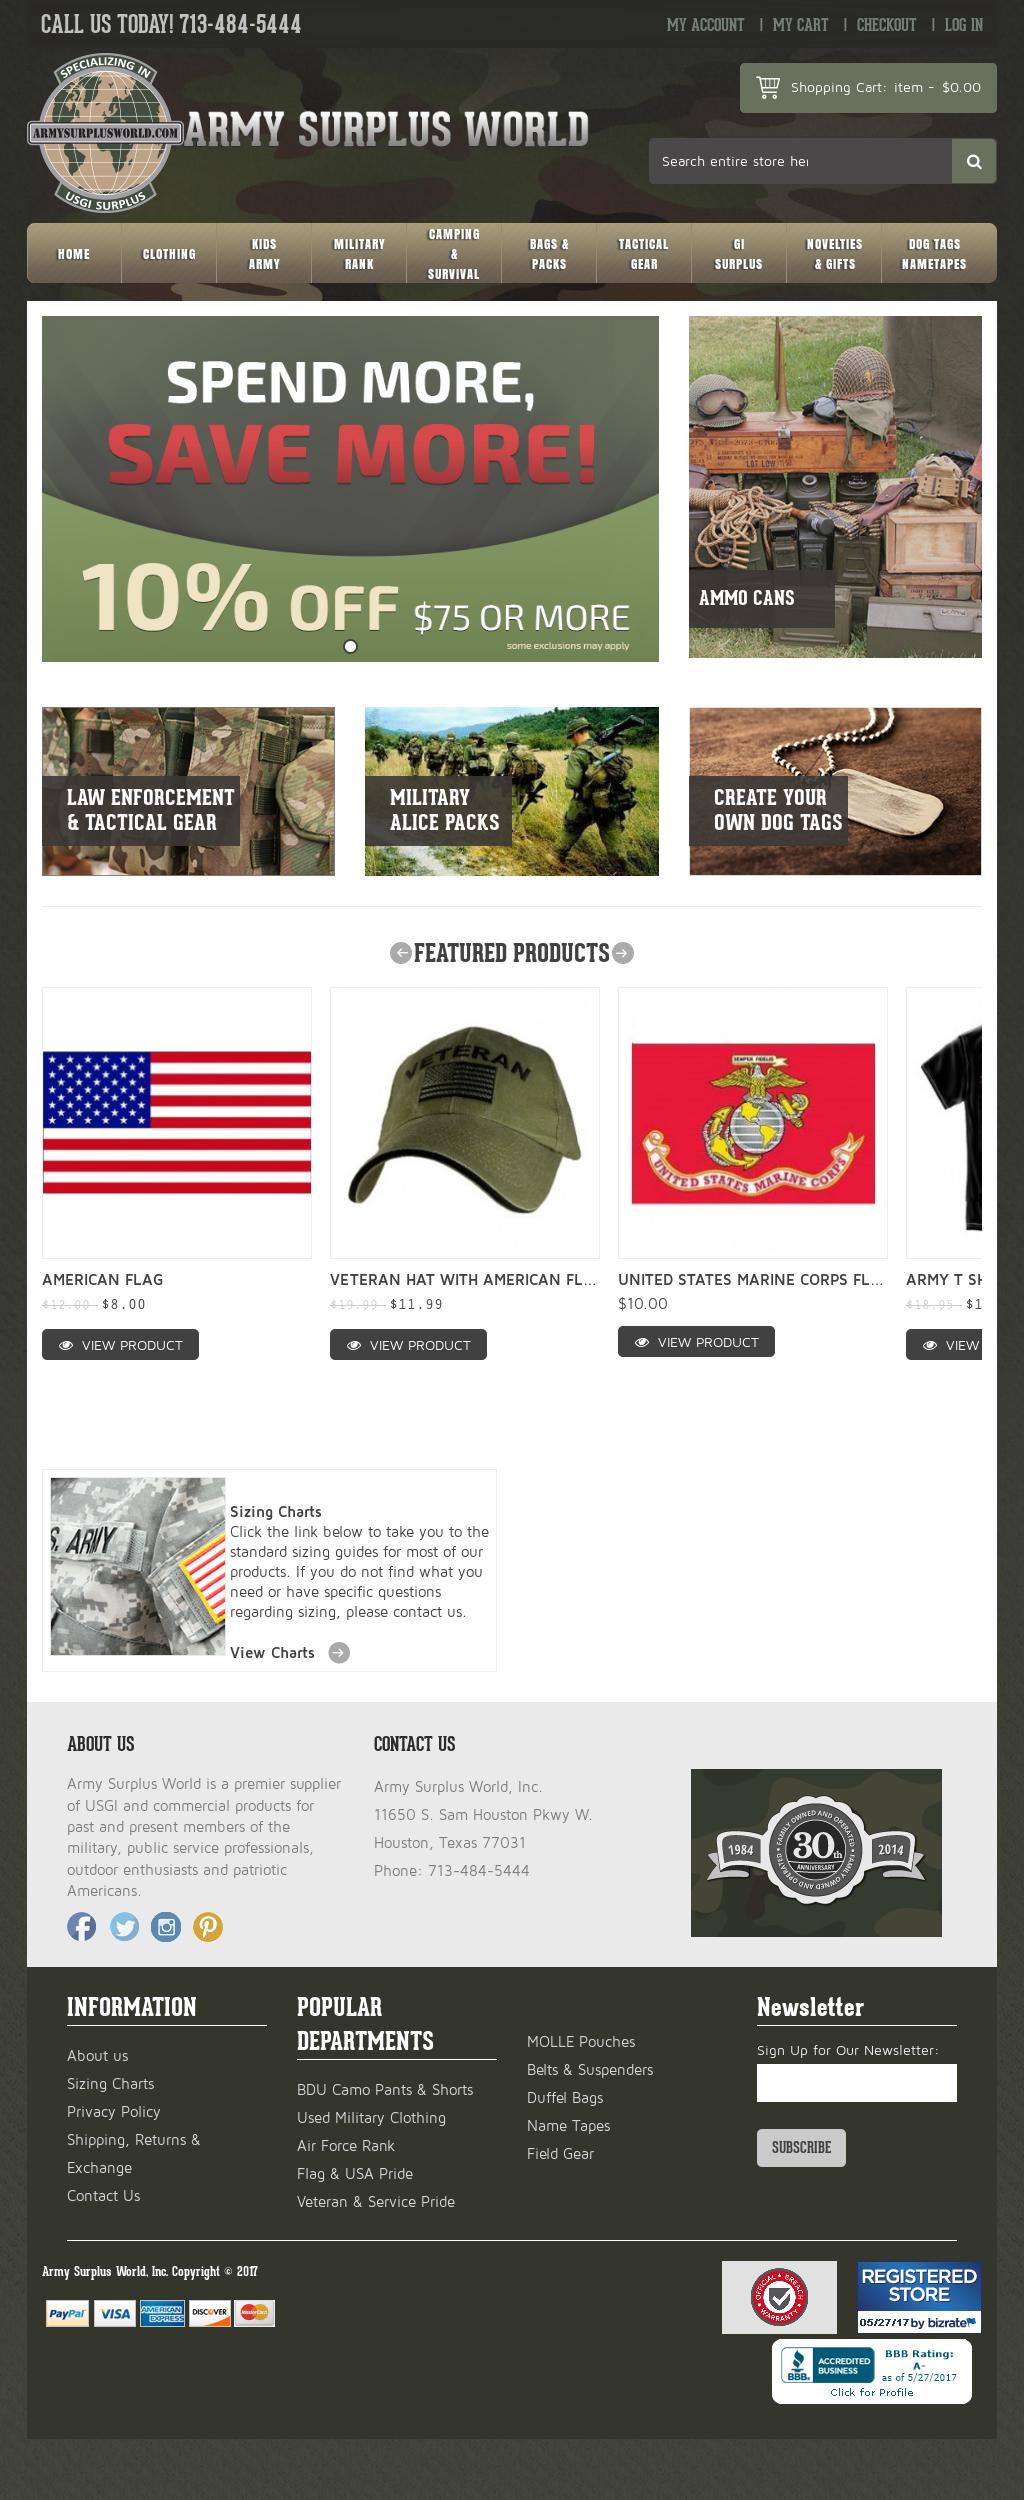 Armysurplusworld Competitors, Revenue and Employees - Owler